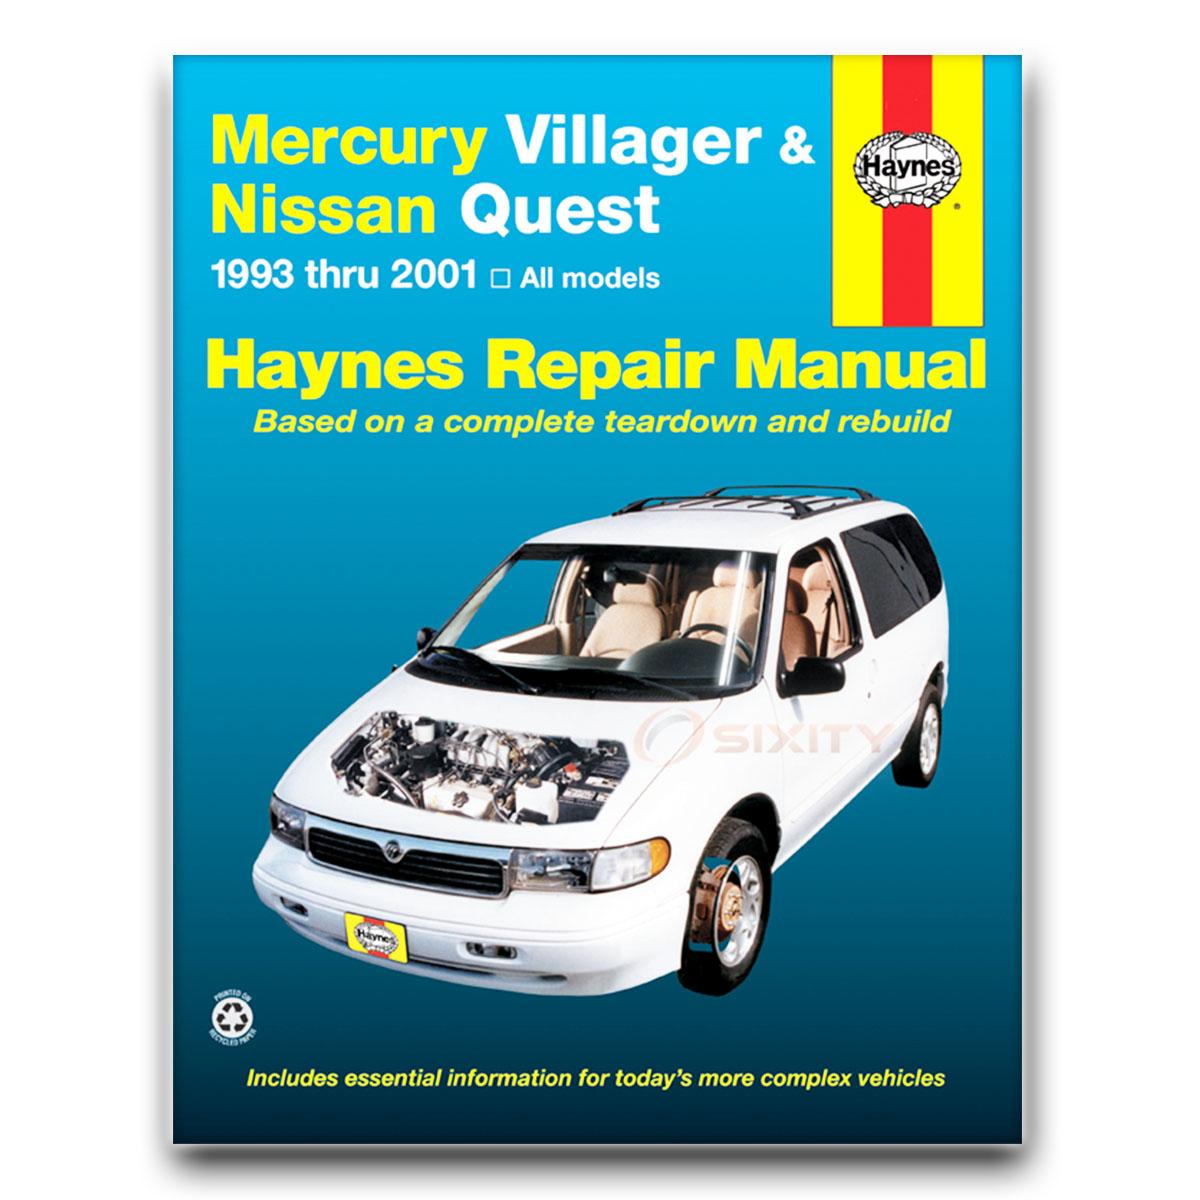 nissan quest haynes repair manual gle xe se gxe shop service garage rh ebay com 2001 Nissan Sentra 2001 Nissan Quest Wipers Arm